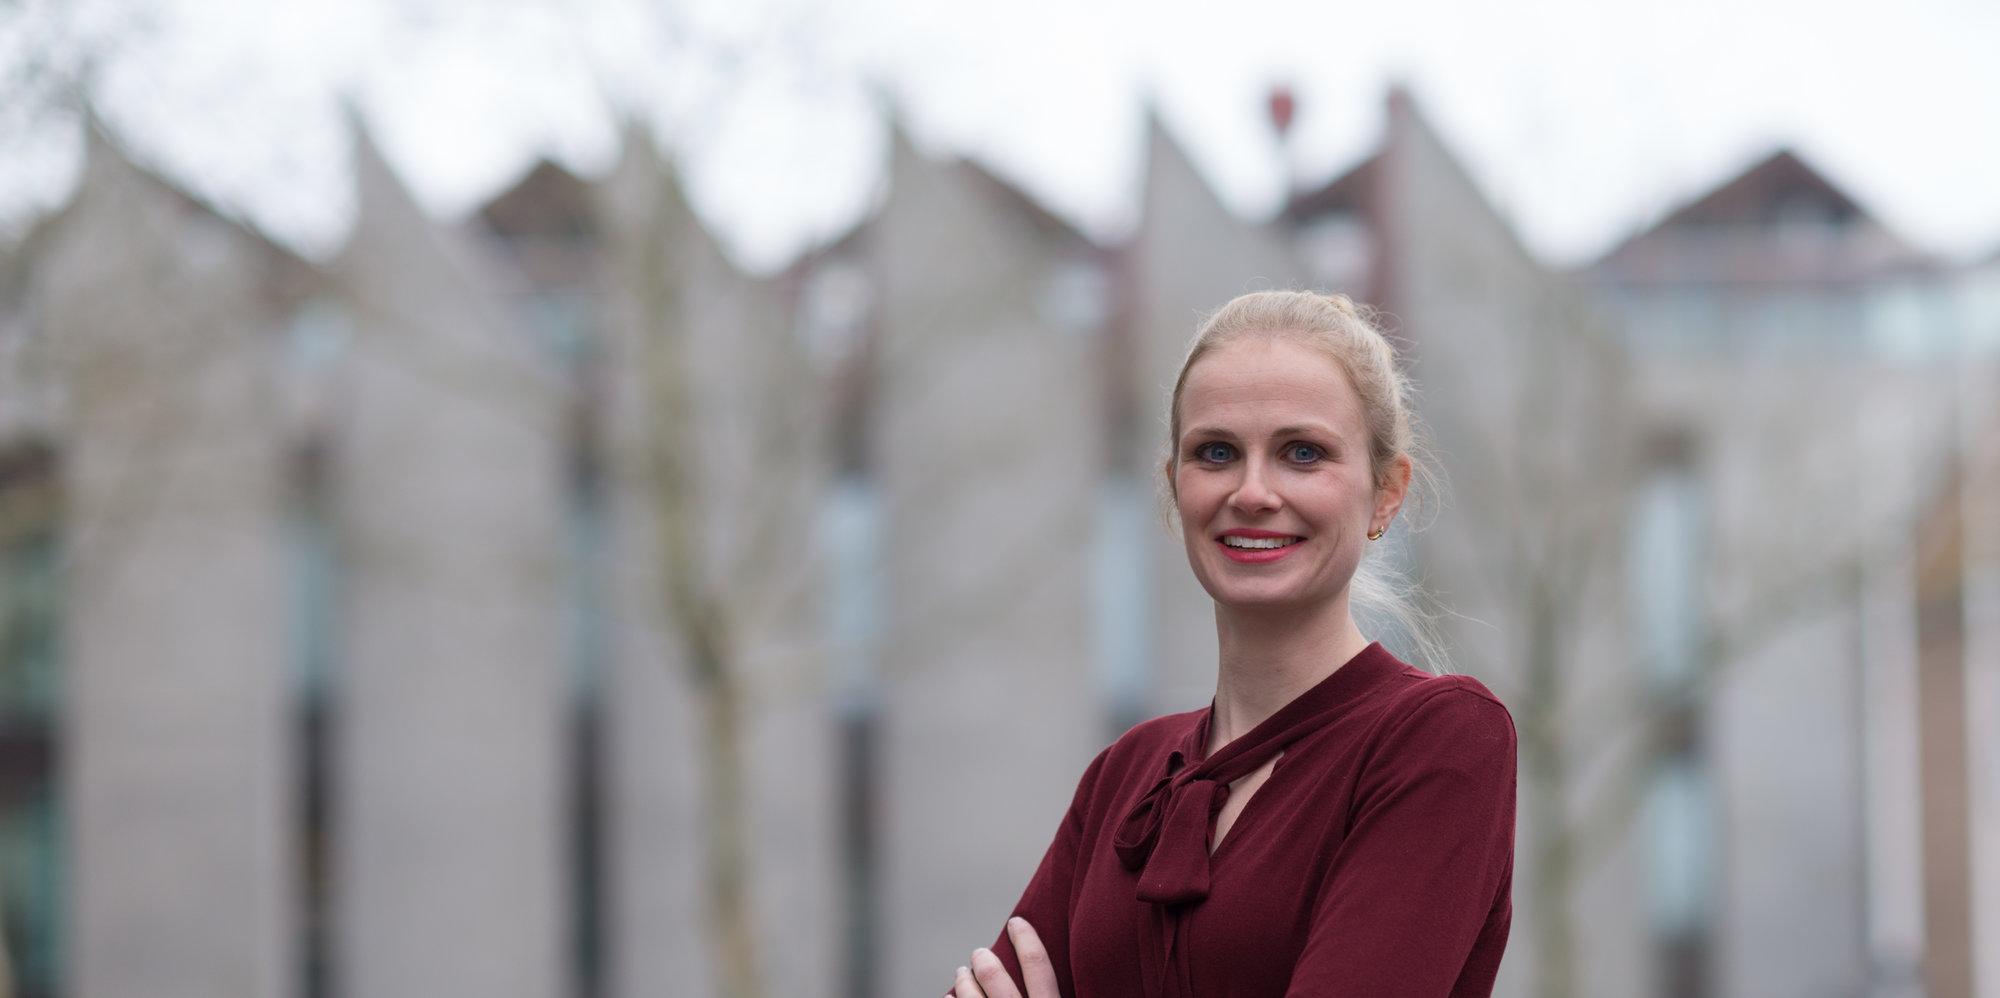 Esther Wijnne-Oosterhoff